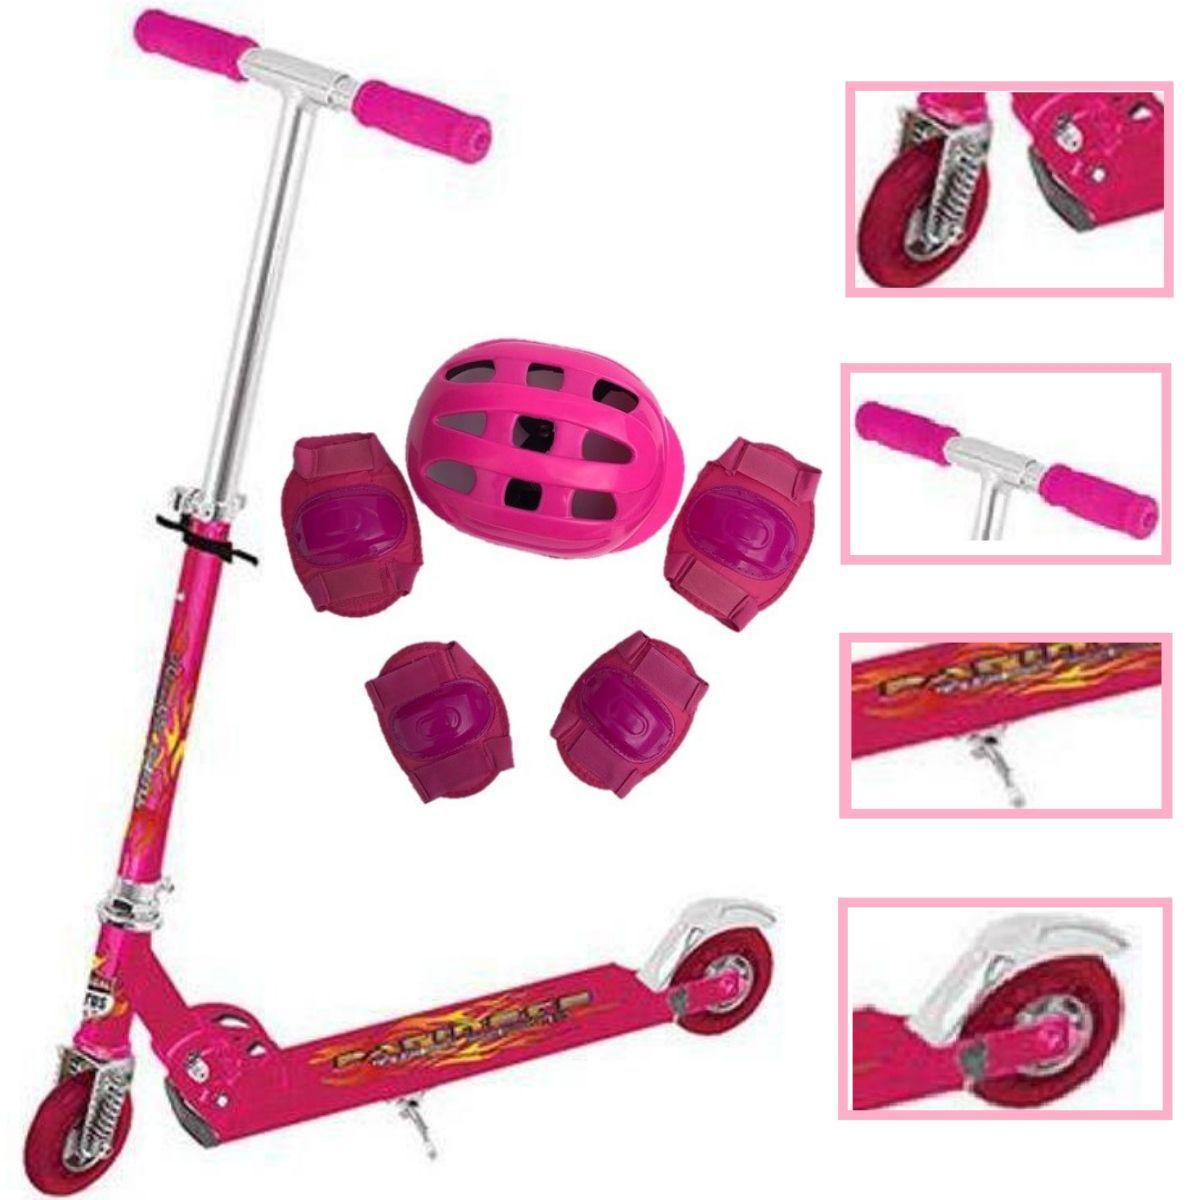 Kit Patinete Infantil Alumínio + Kit Proteção Rosa Para Meninas - TR-1018+CP02R - FULLFILMENT JULINETSHOP